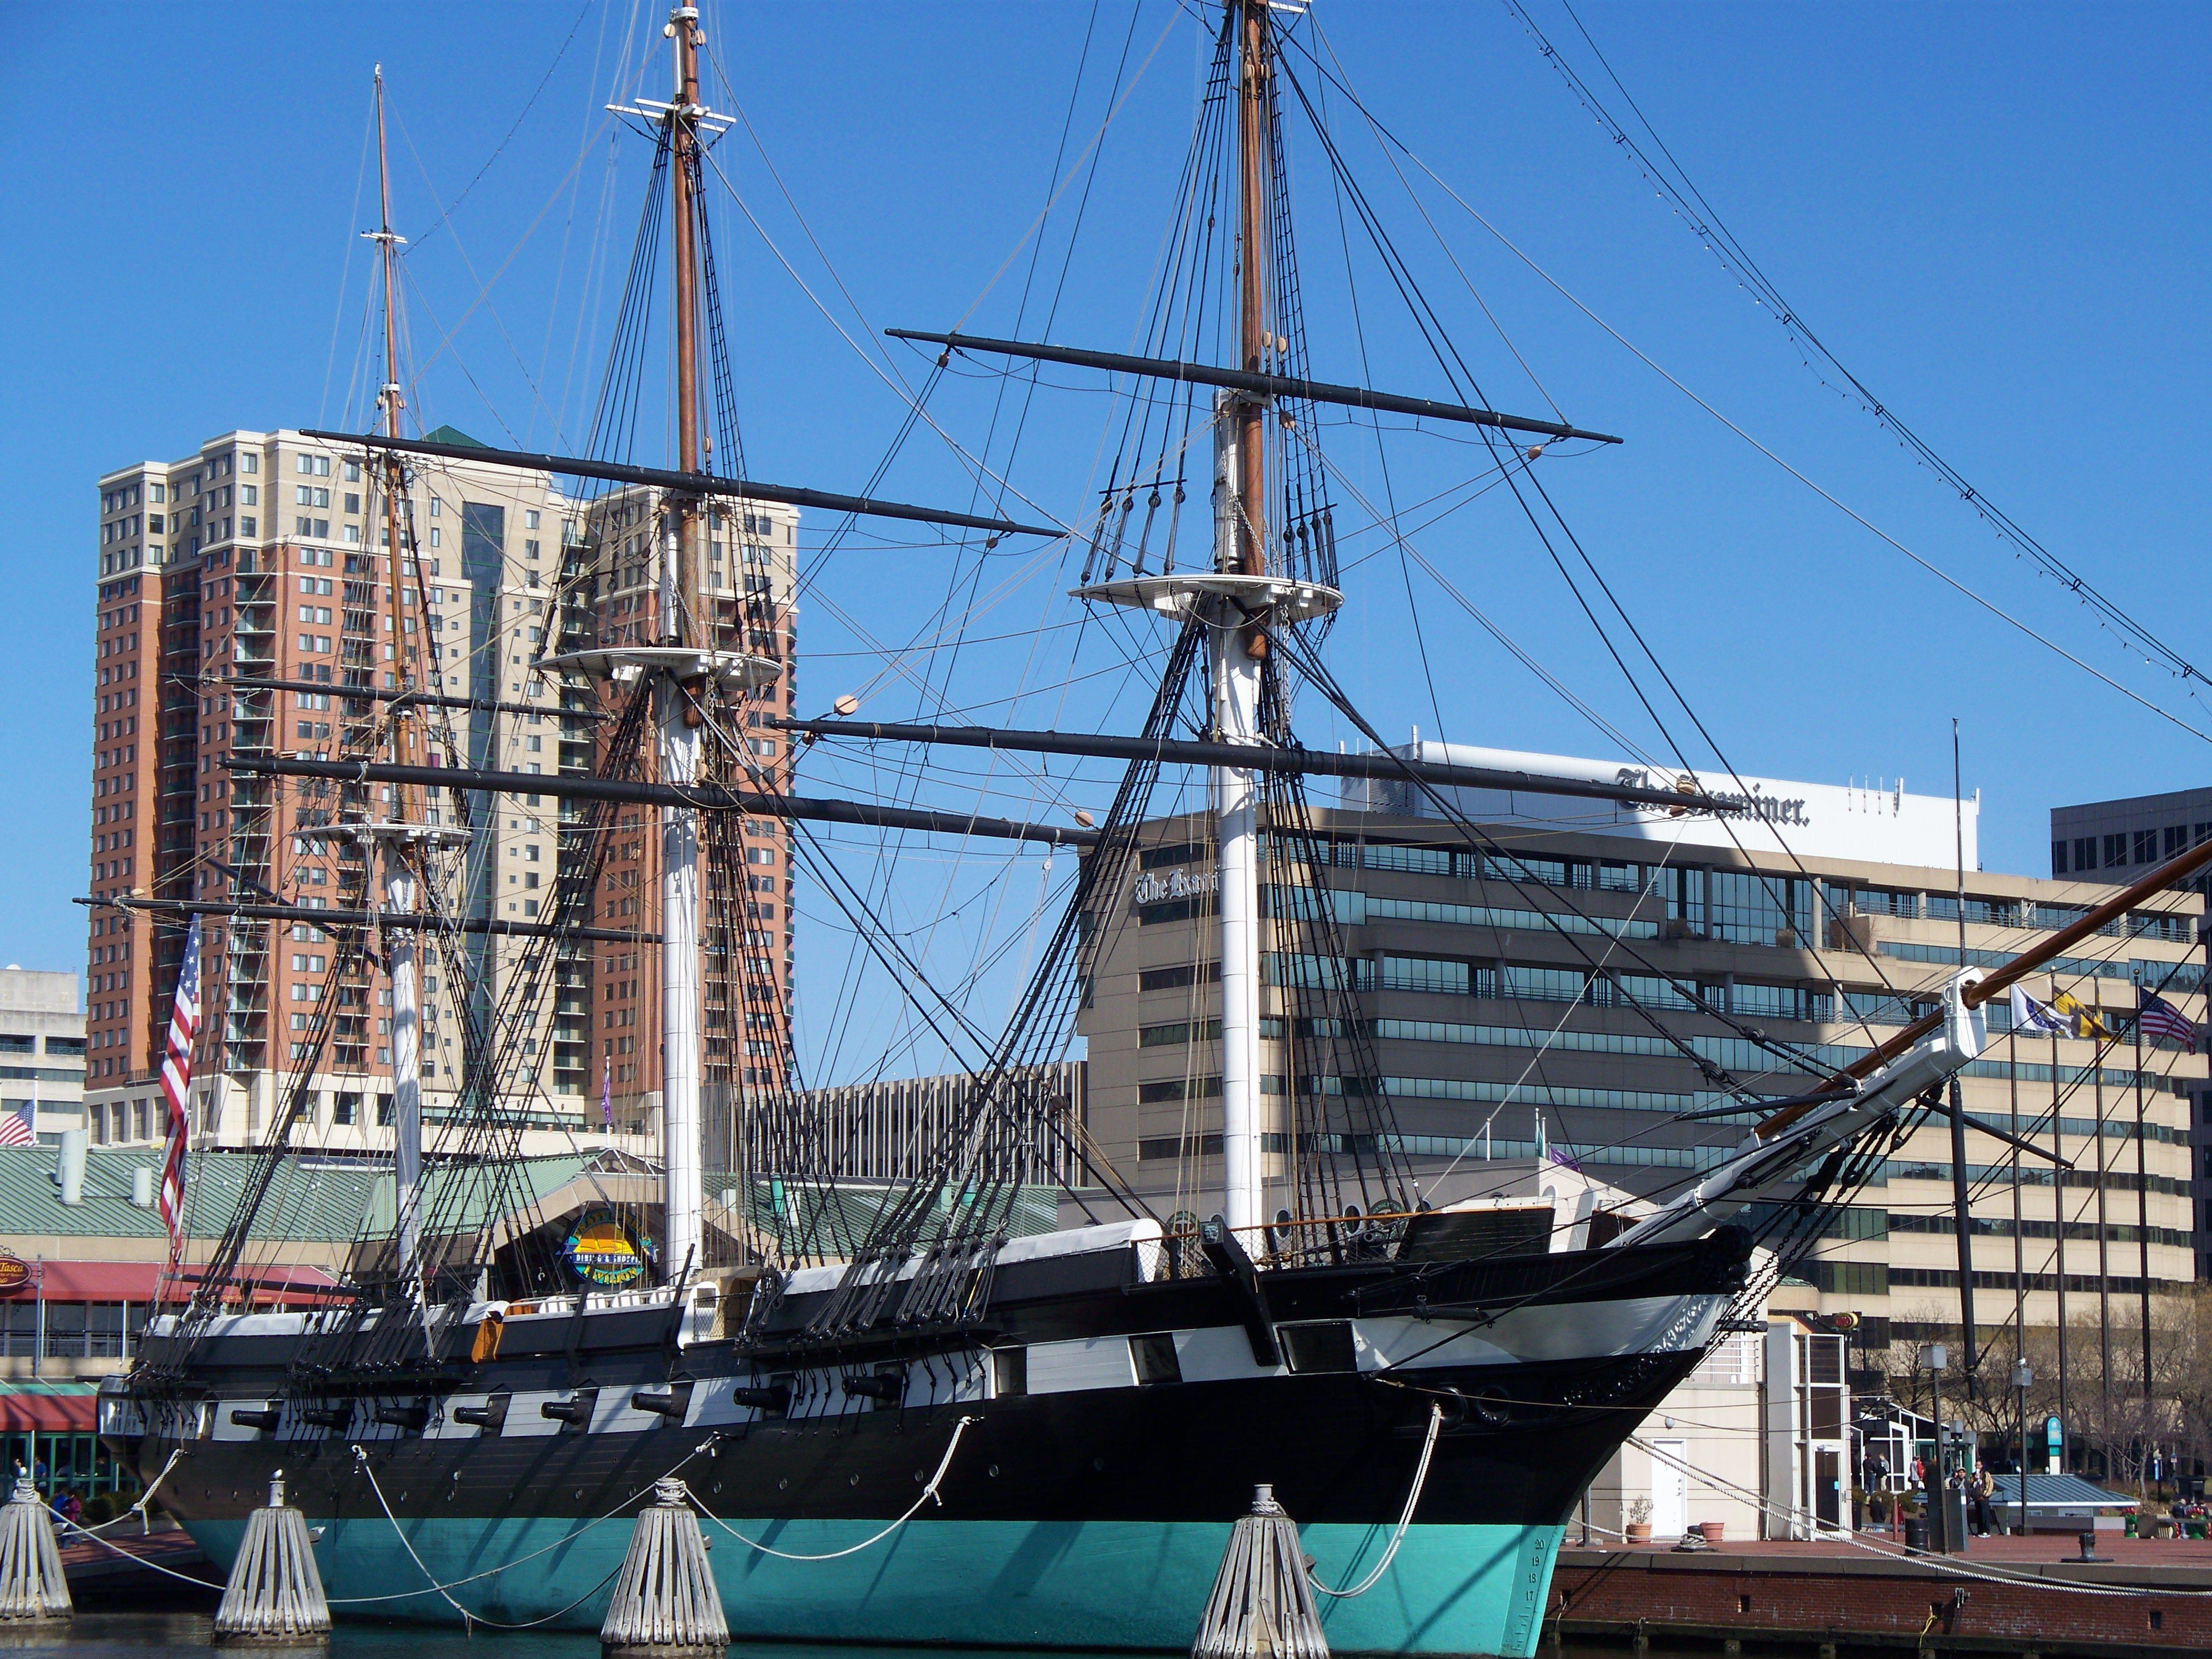 Historic Ships In Baltimore's Inner Harbor